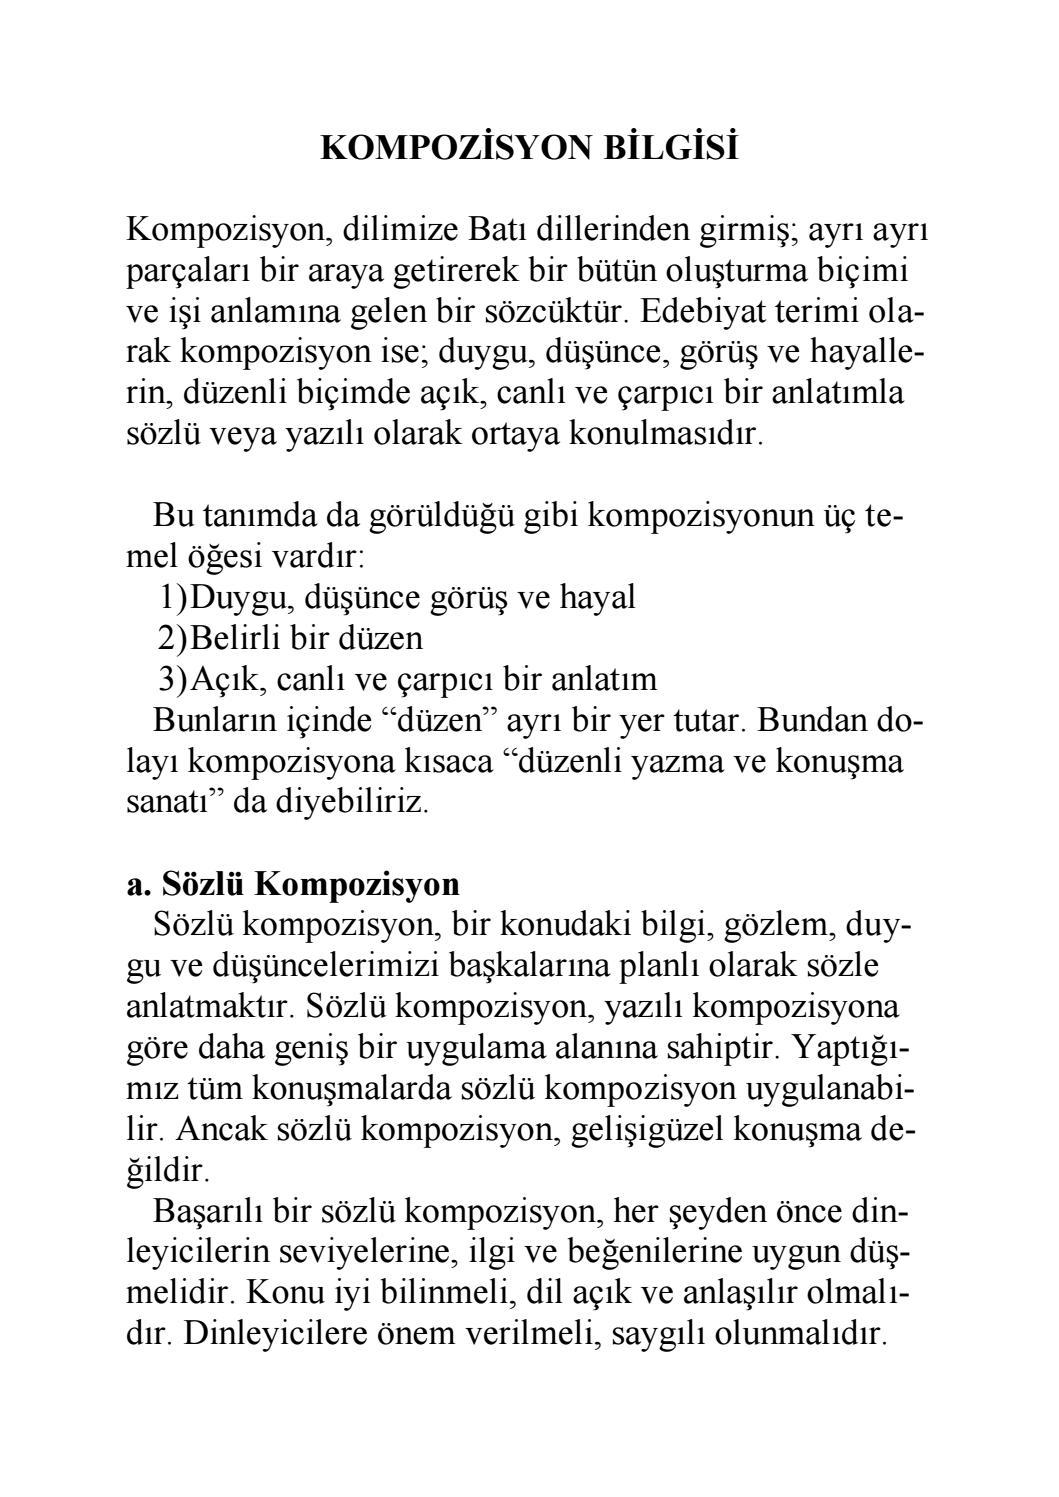 Kompozisyona epigraf: doğru yaklaşım 5